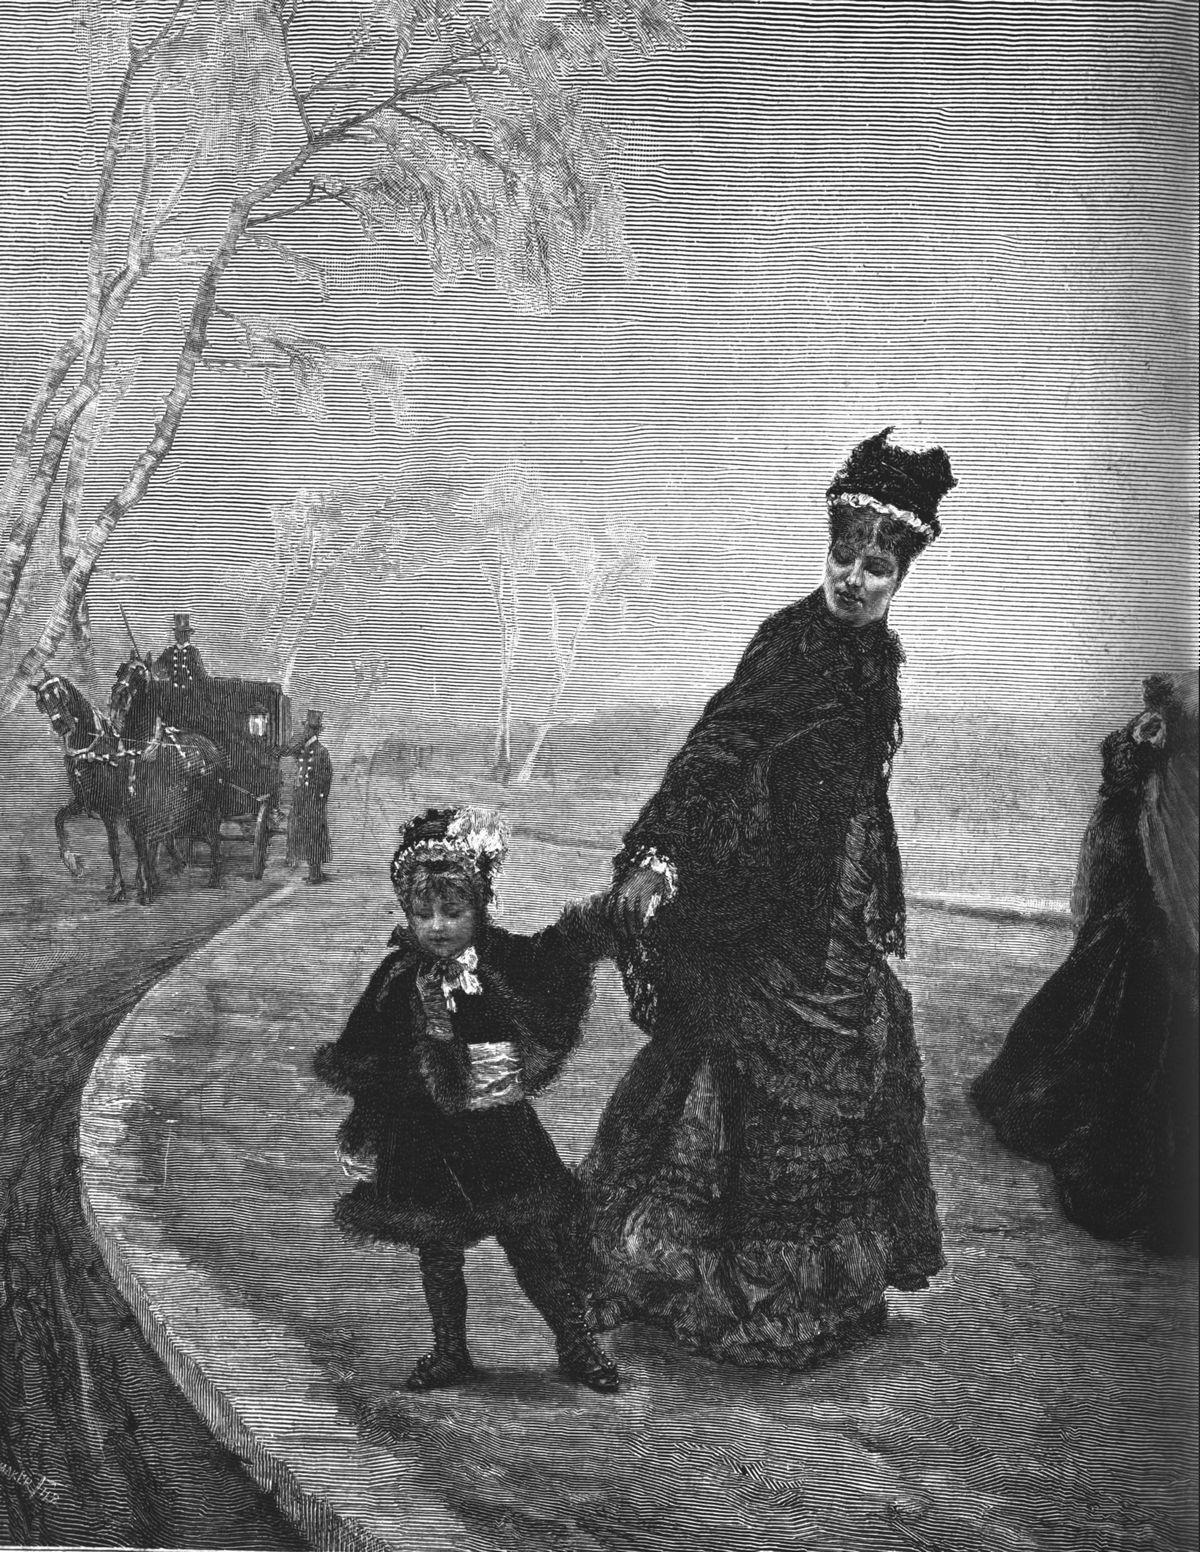 Fai-ti froid! tableau de M. de Nittis. (Gravure 1874)